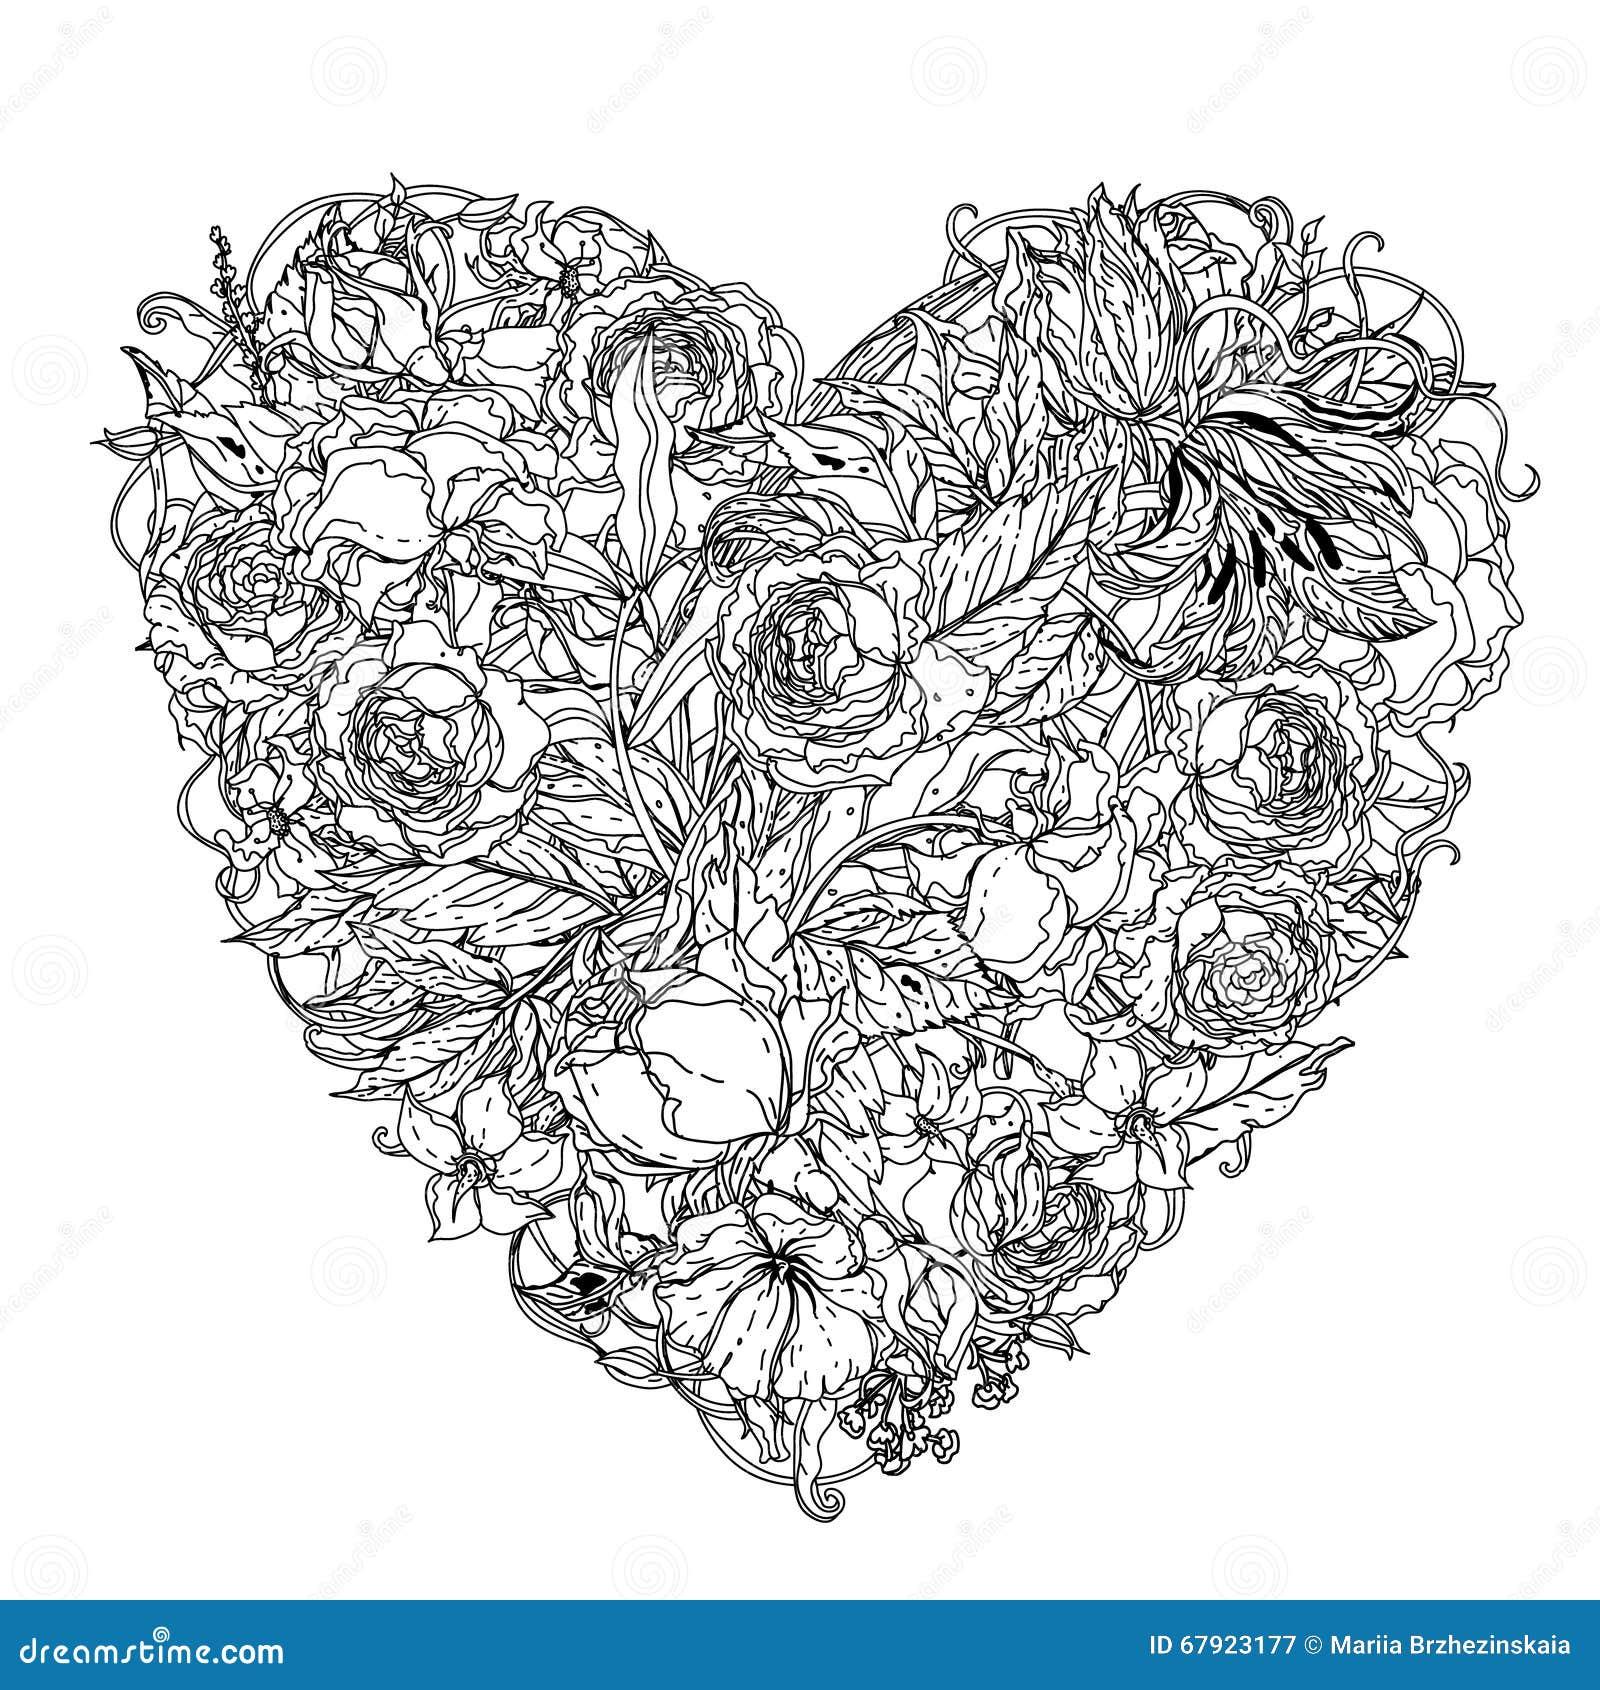 Gratis Kleurplaat Vlinder Hand Drawing Zentangle Element Black And White Flower